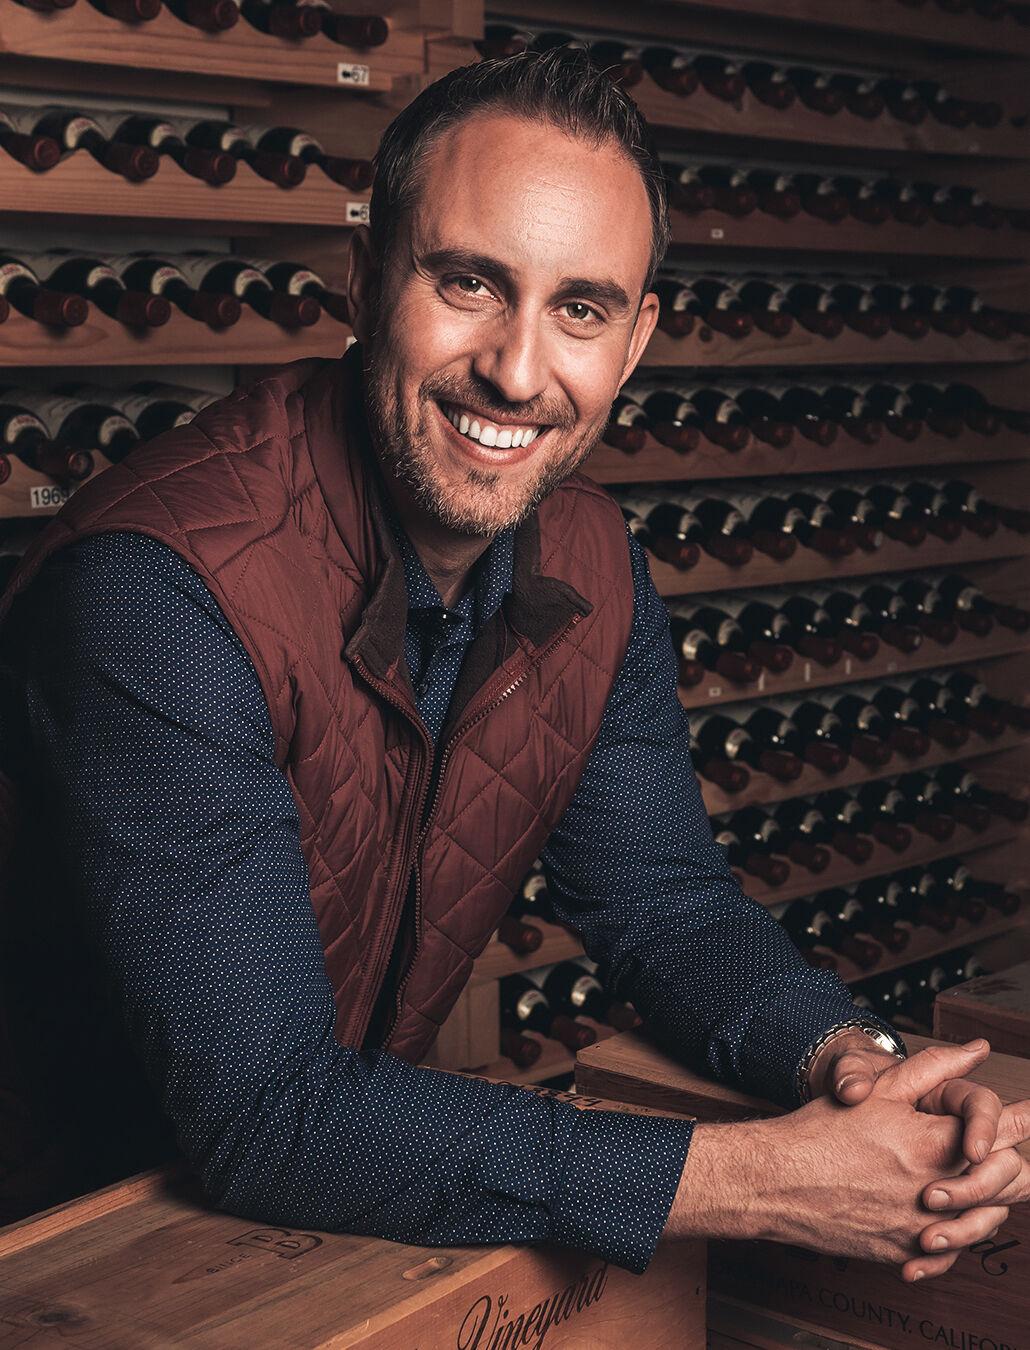 BV Chief Winemaker Trevor Durling